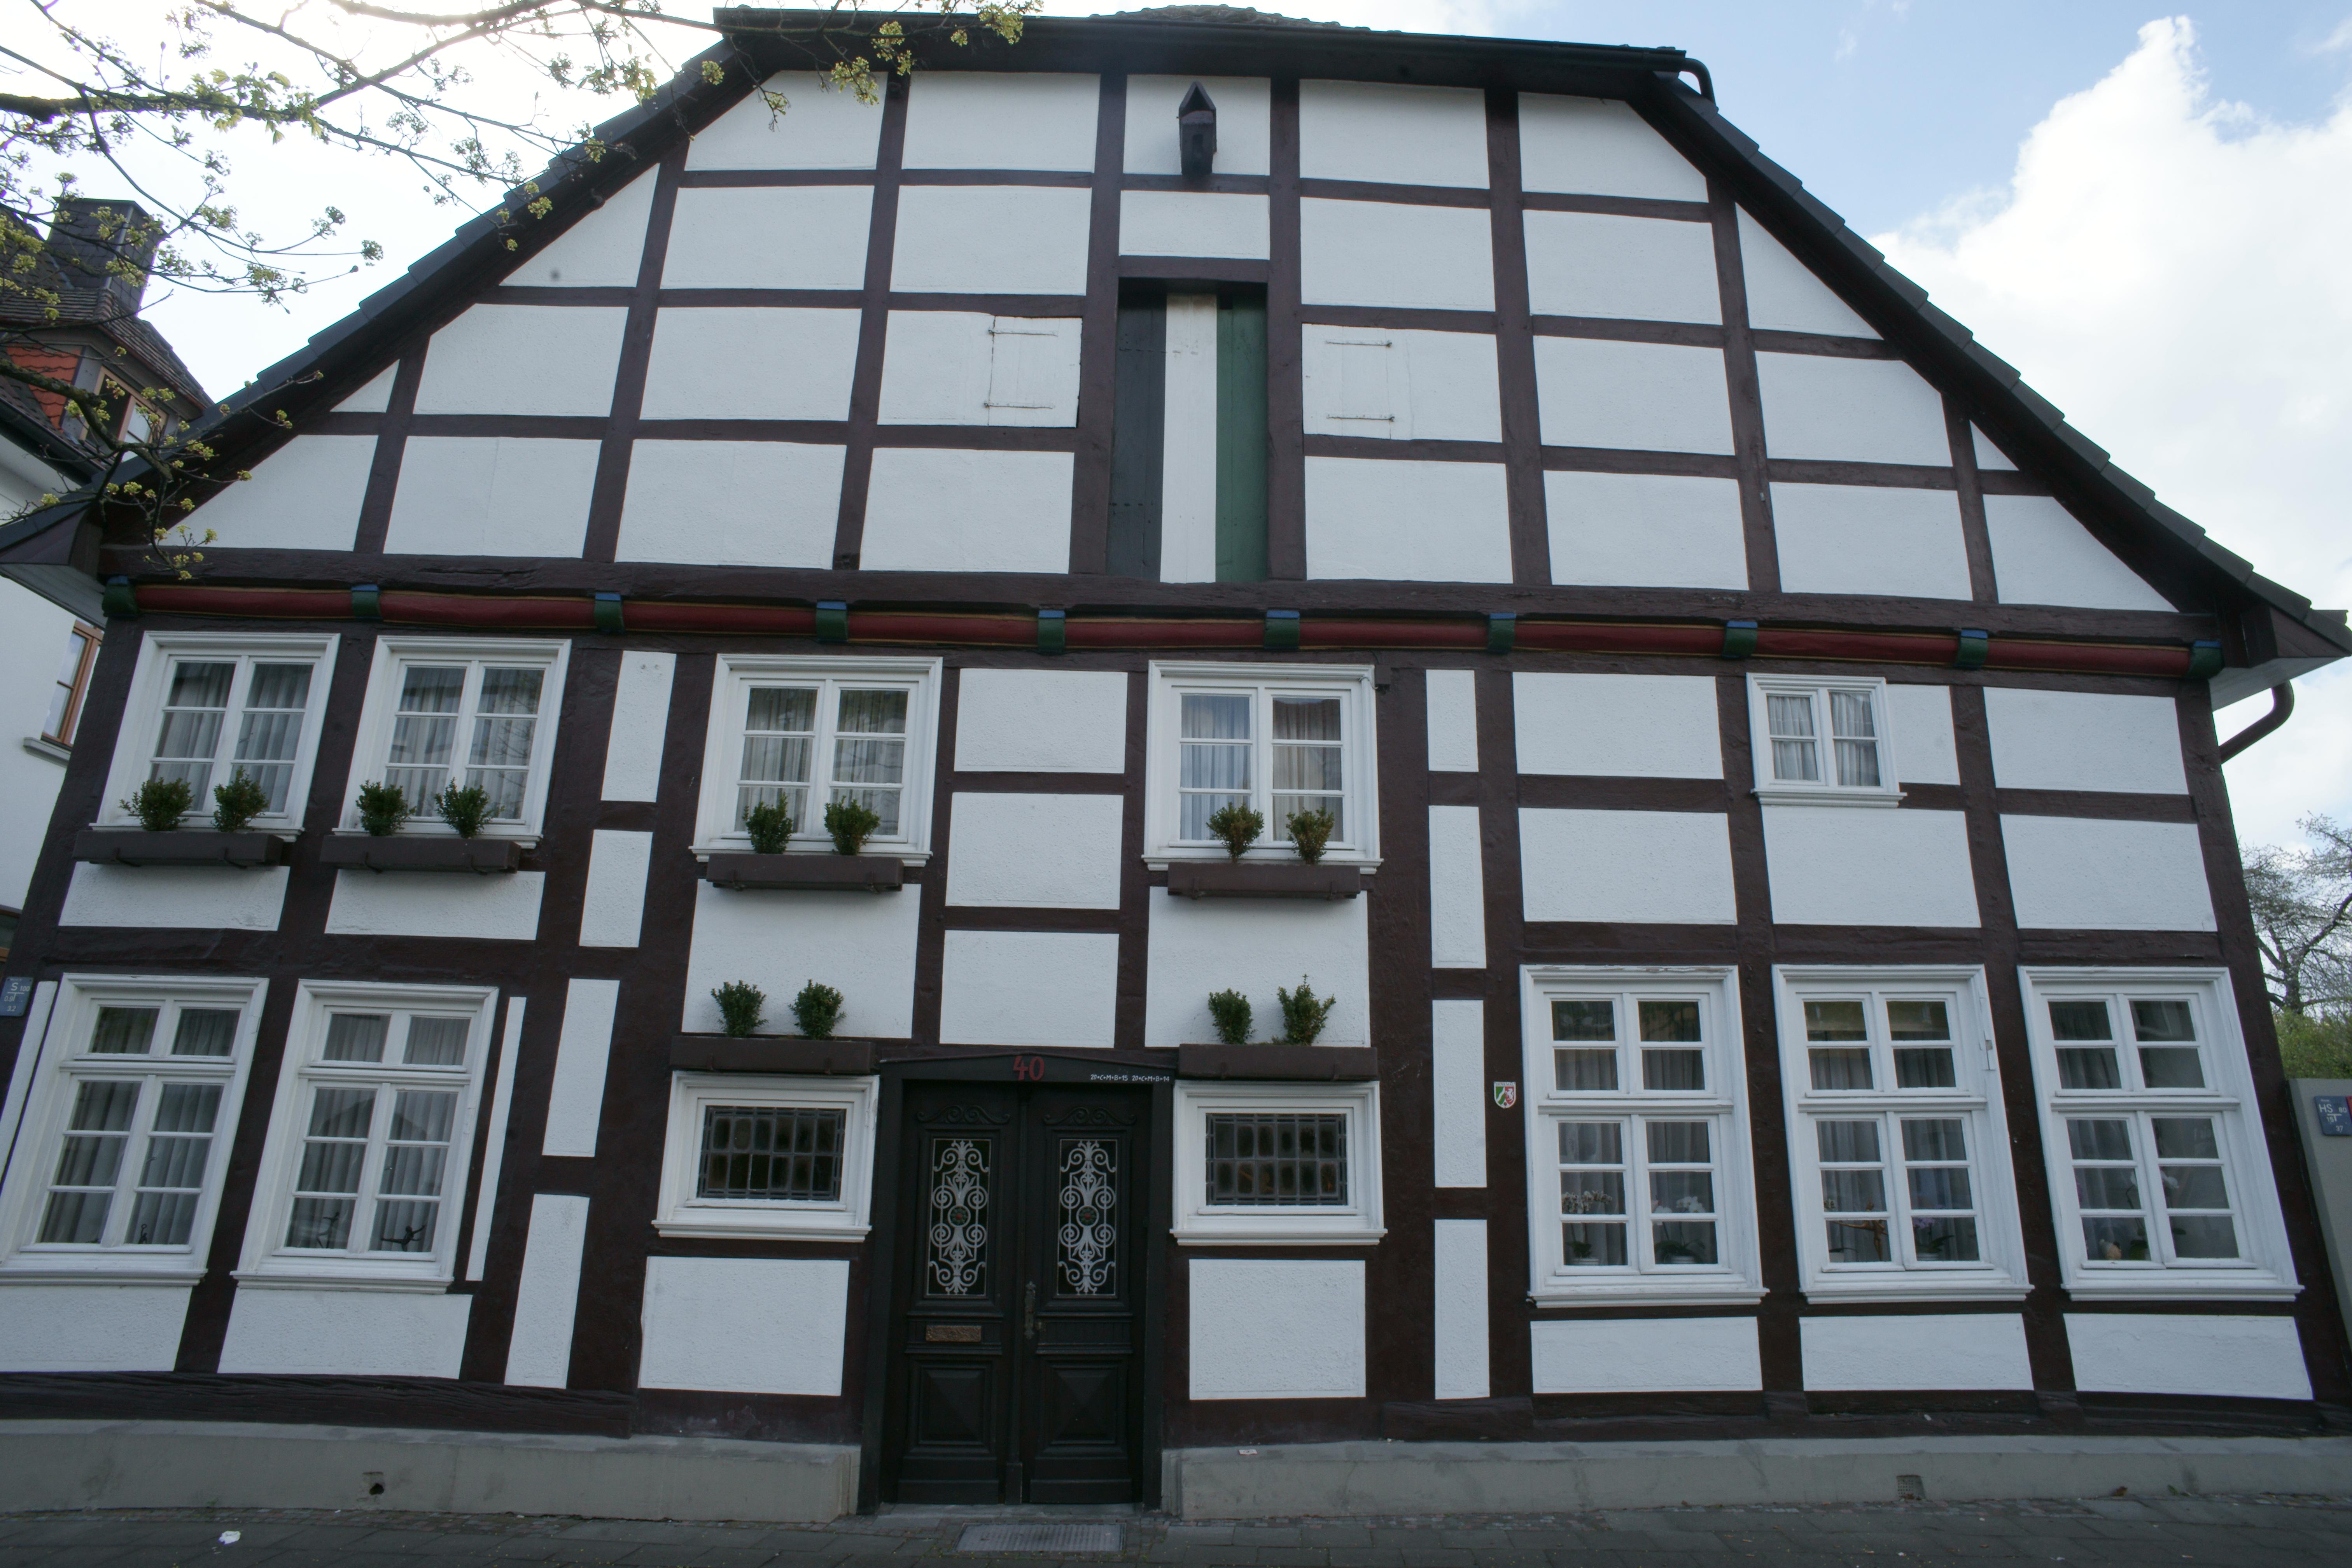 File:Denkmal Bachstr. 40 in Geseke.JPG - Wikimedia Commons